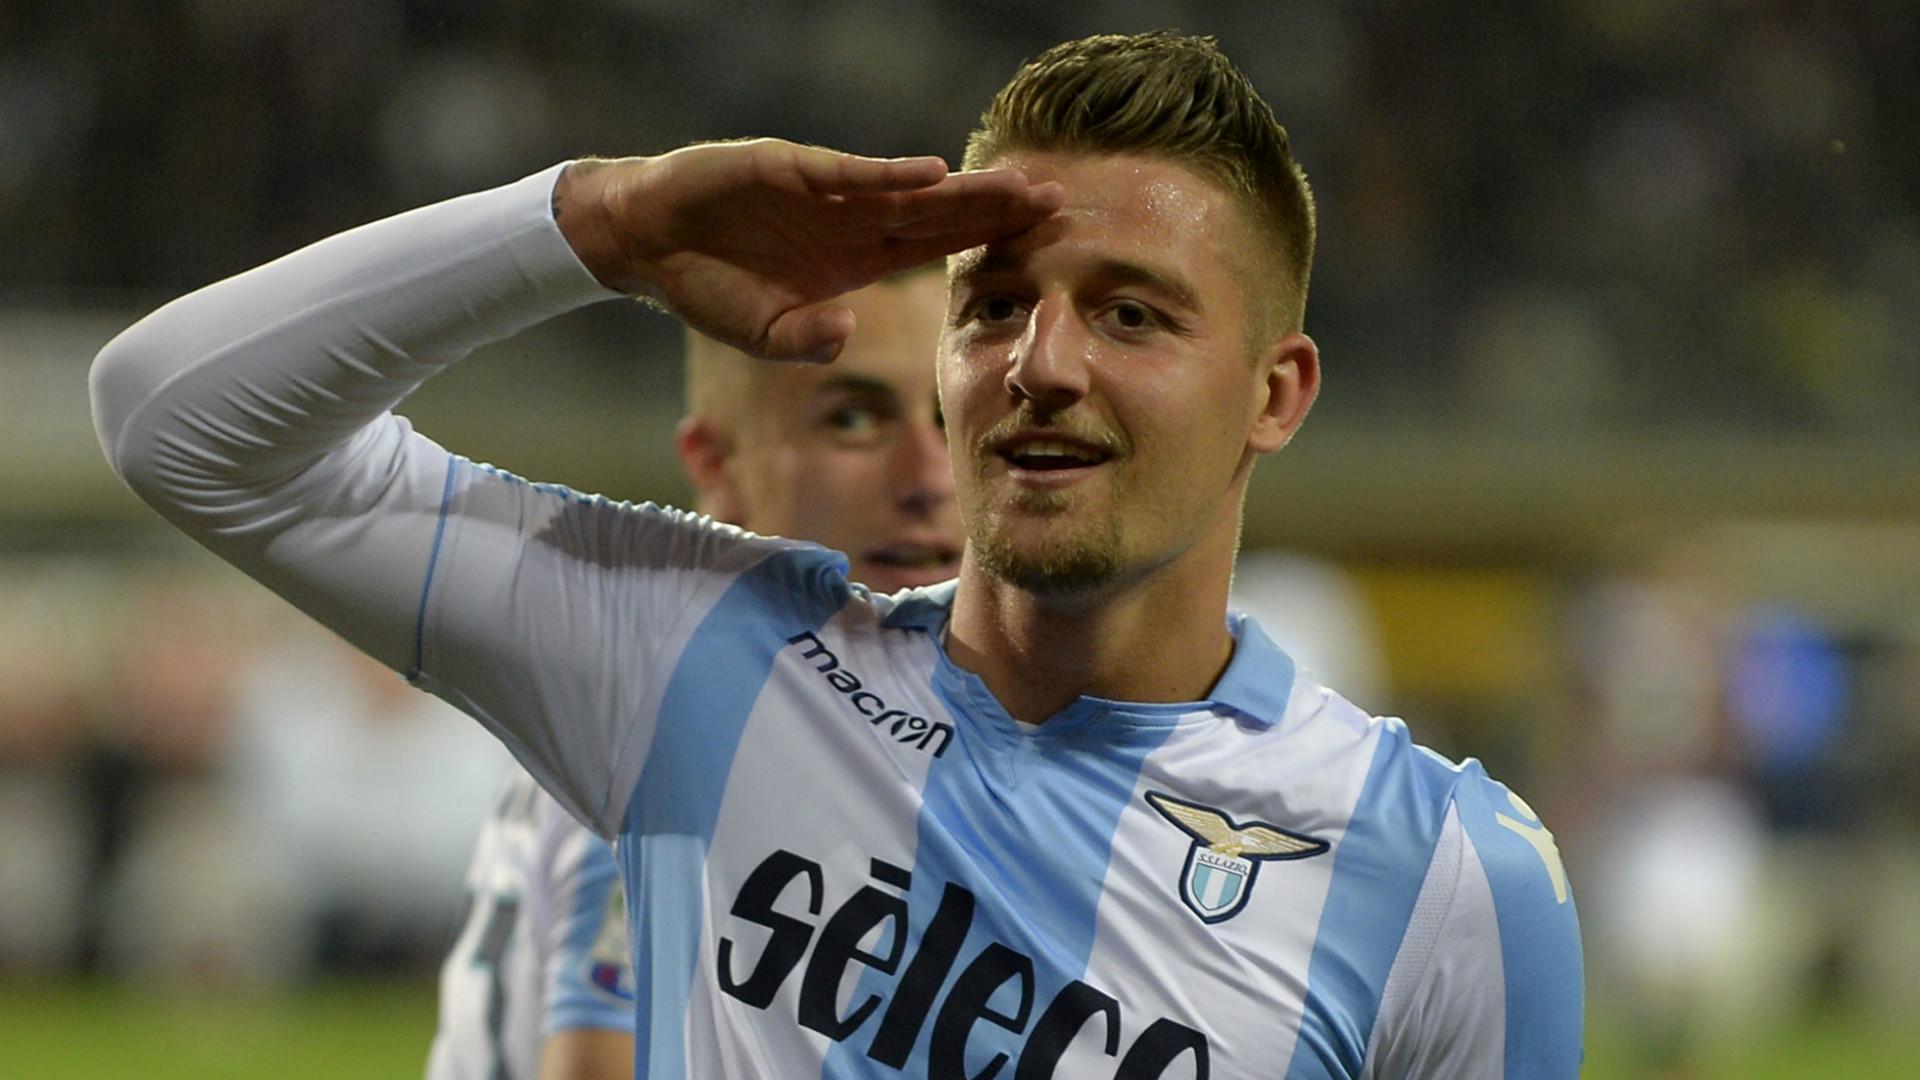 Liverpool could make 'monstrous offer' for Sergej Milinkovic-Savic after Lazio transfer - Bóng Đá